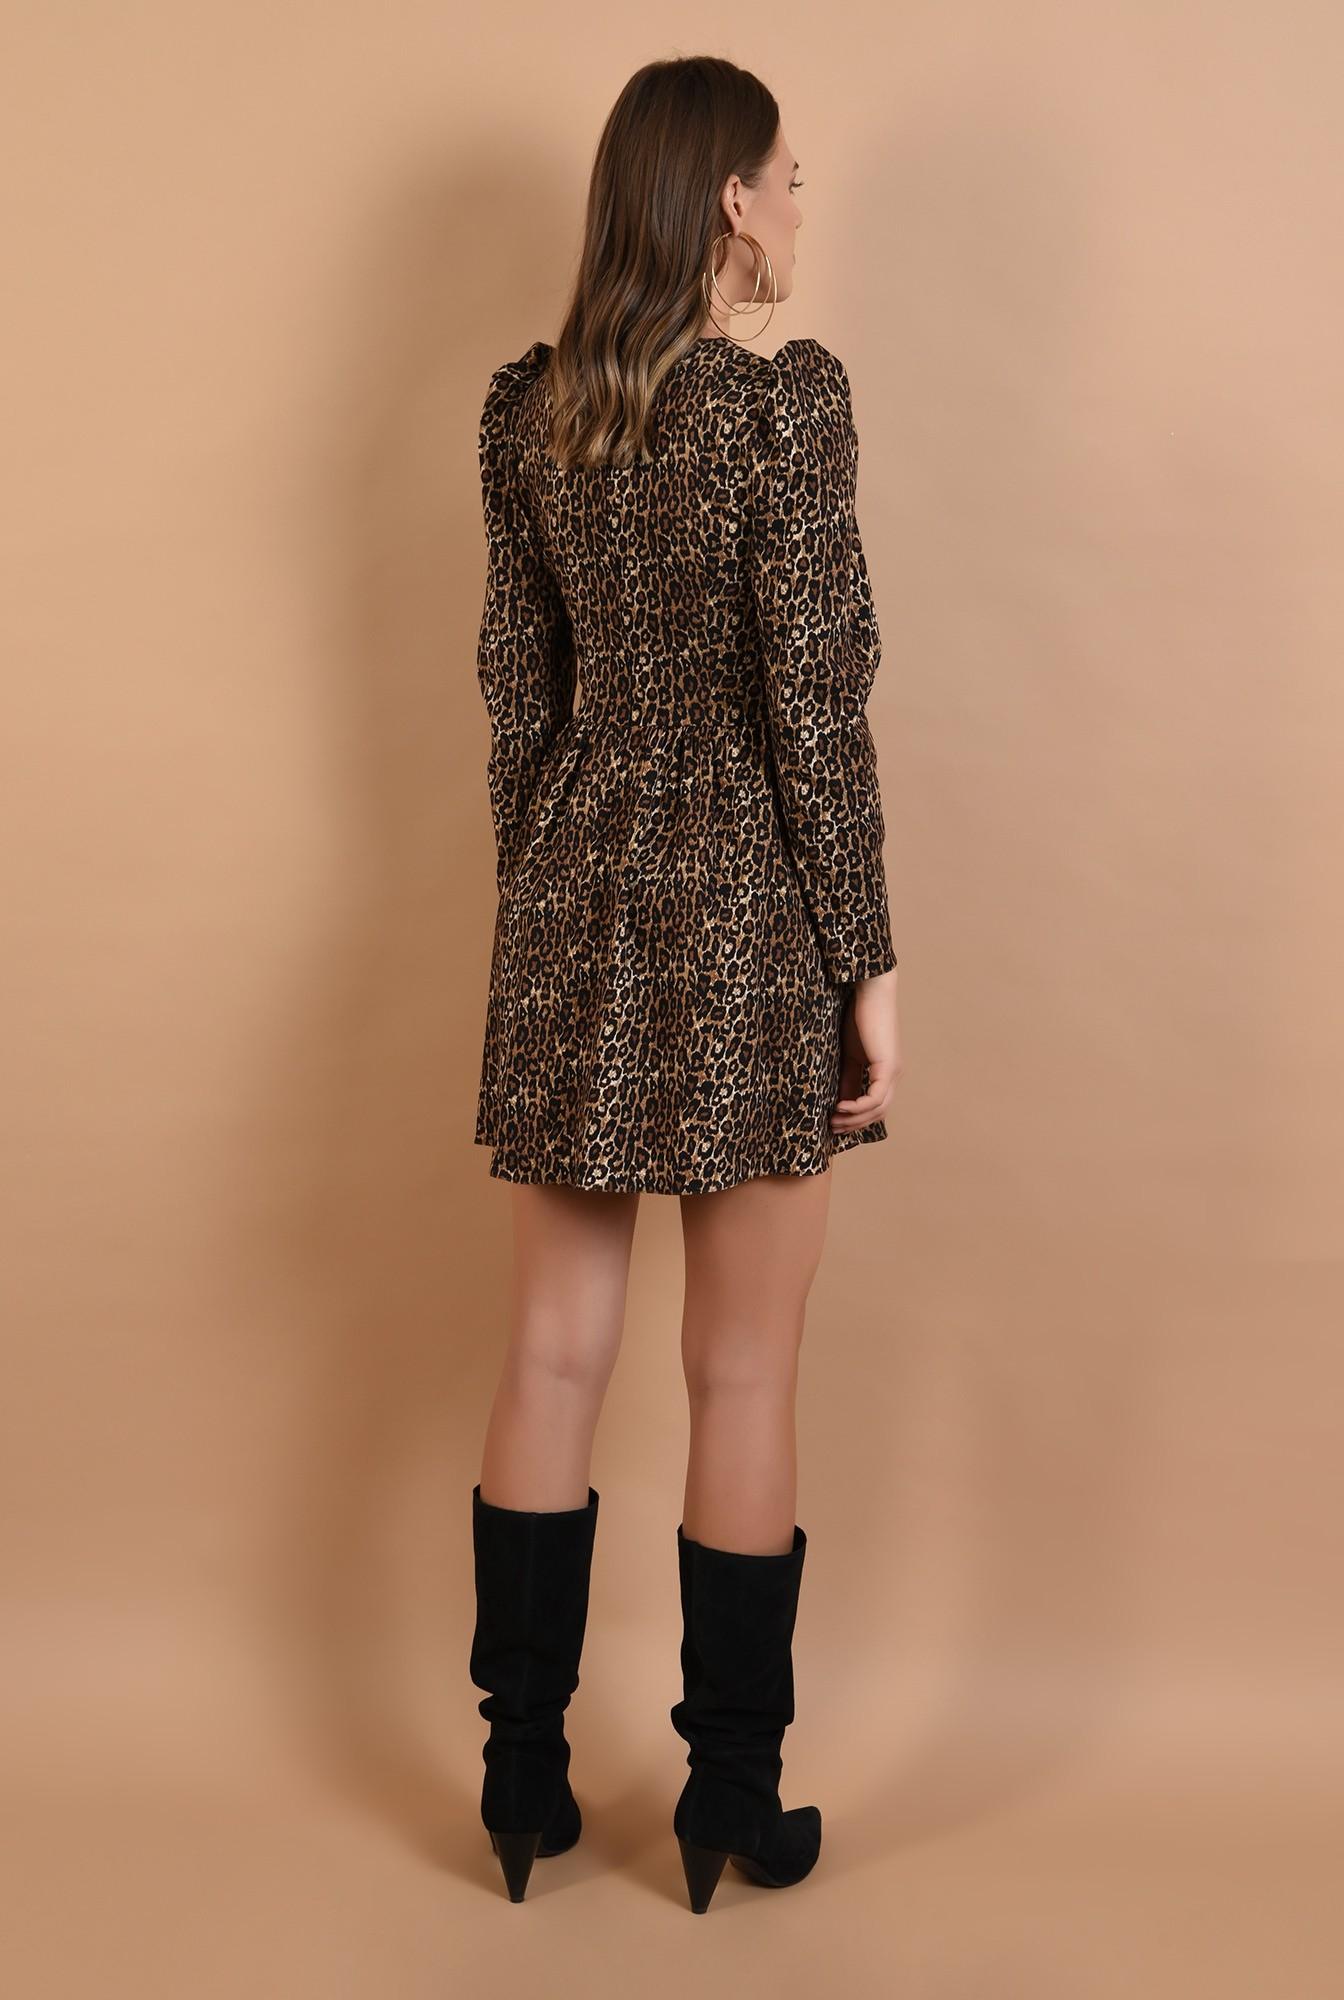 1 - rochie casual, animal print, evazata, bust ajustat, Poema